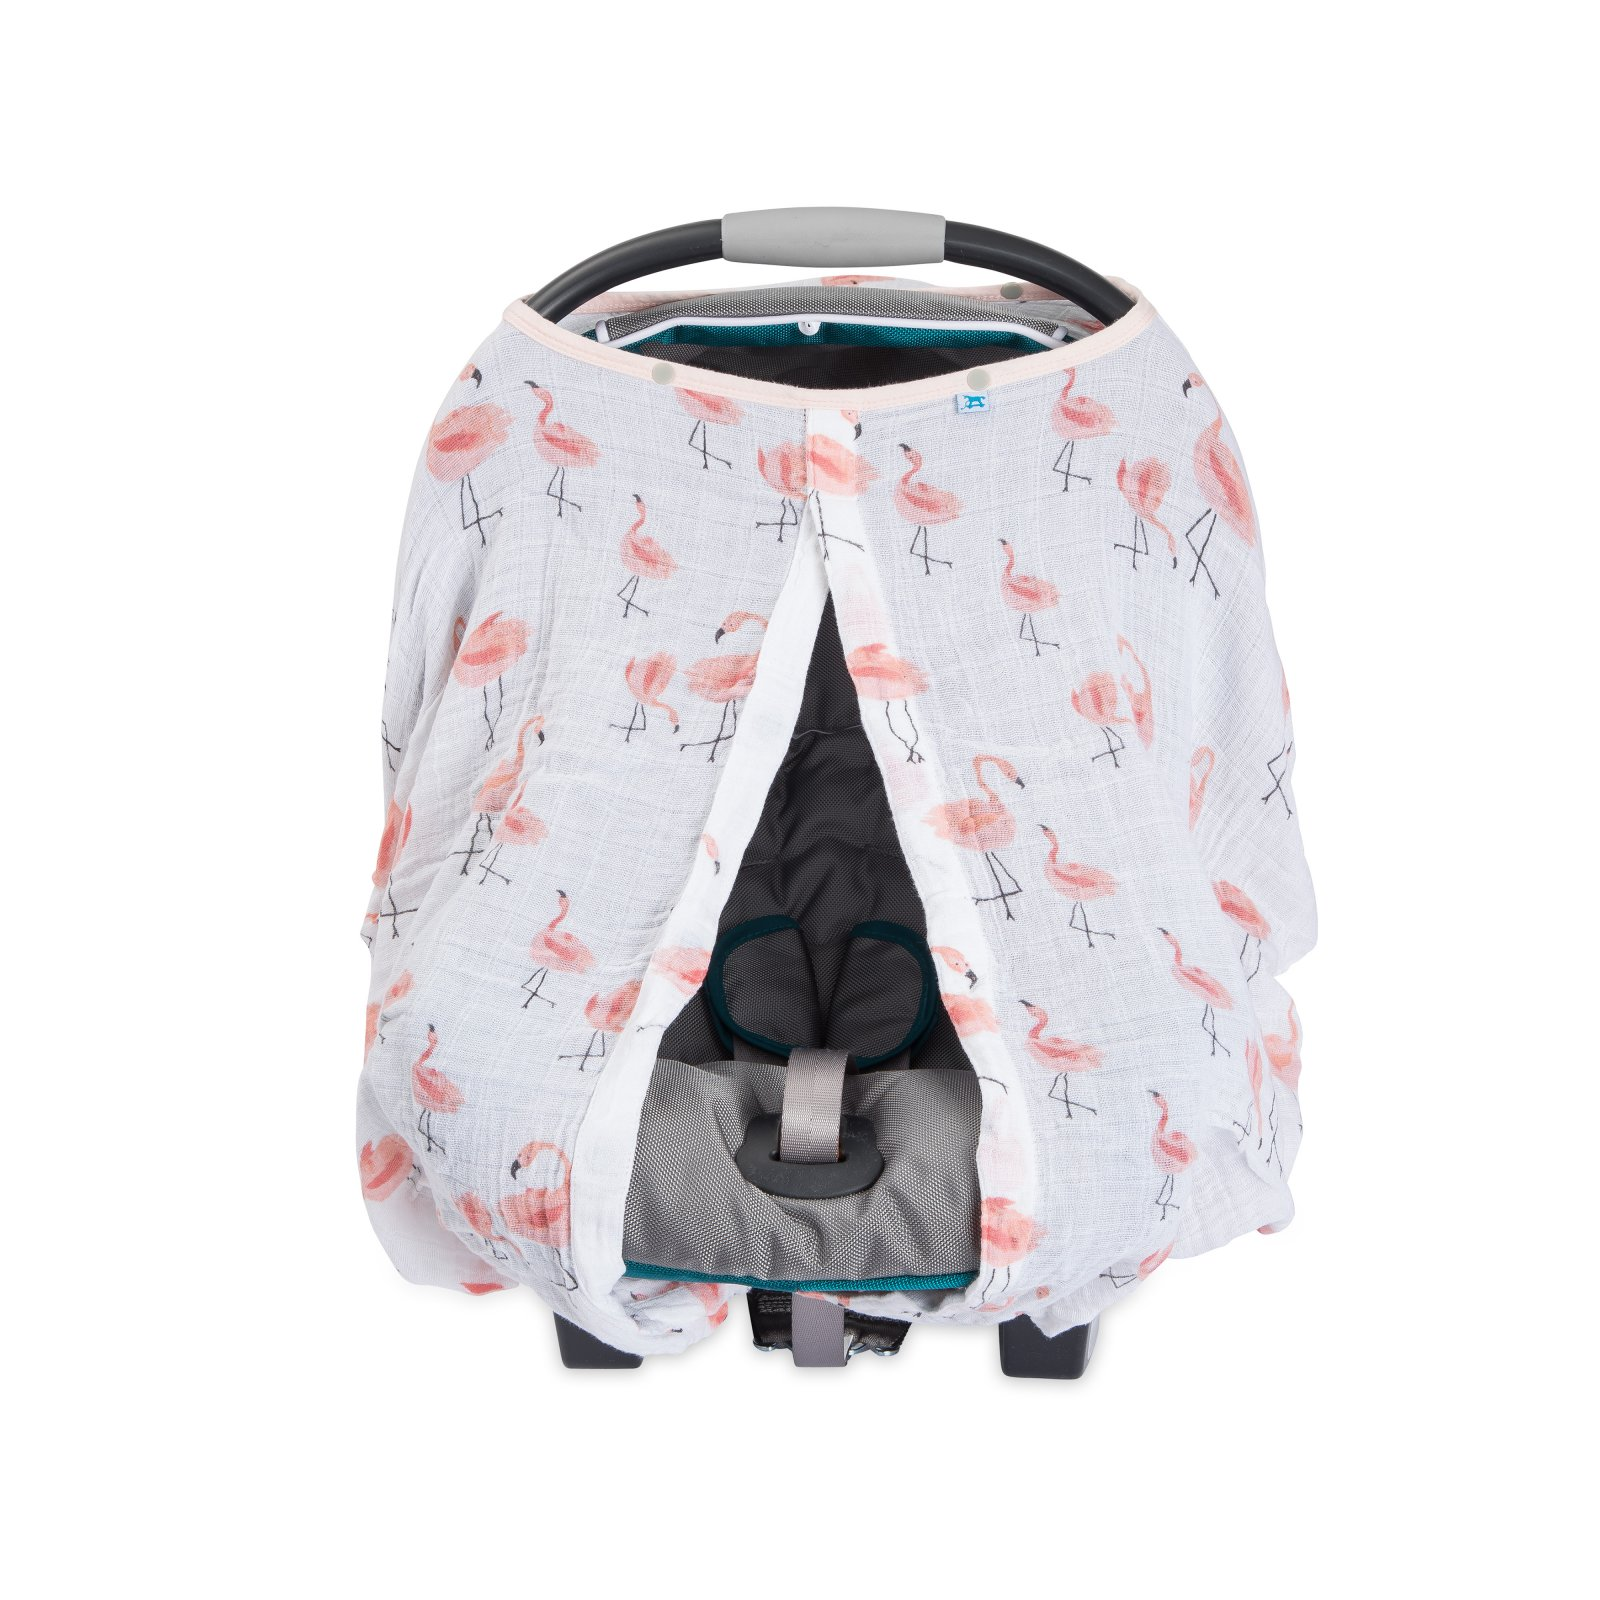 Little Unicorn Cotton Muslin Car Seat Canopy - Pink Ladies